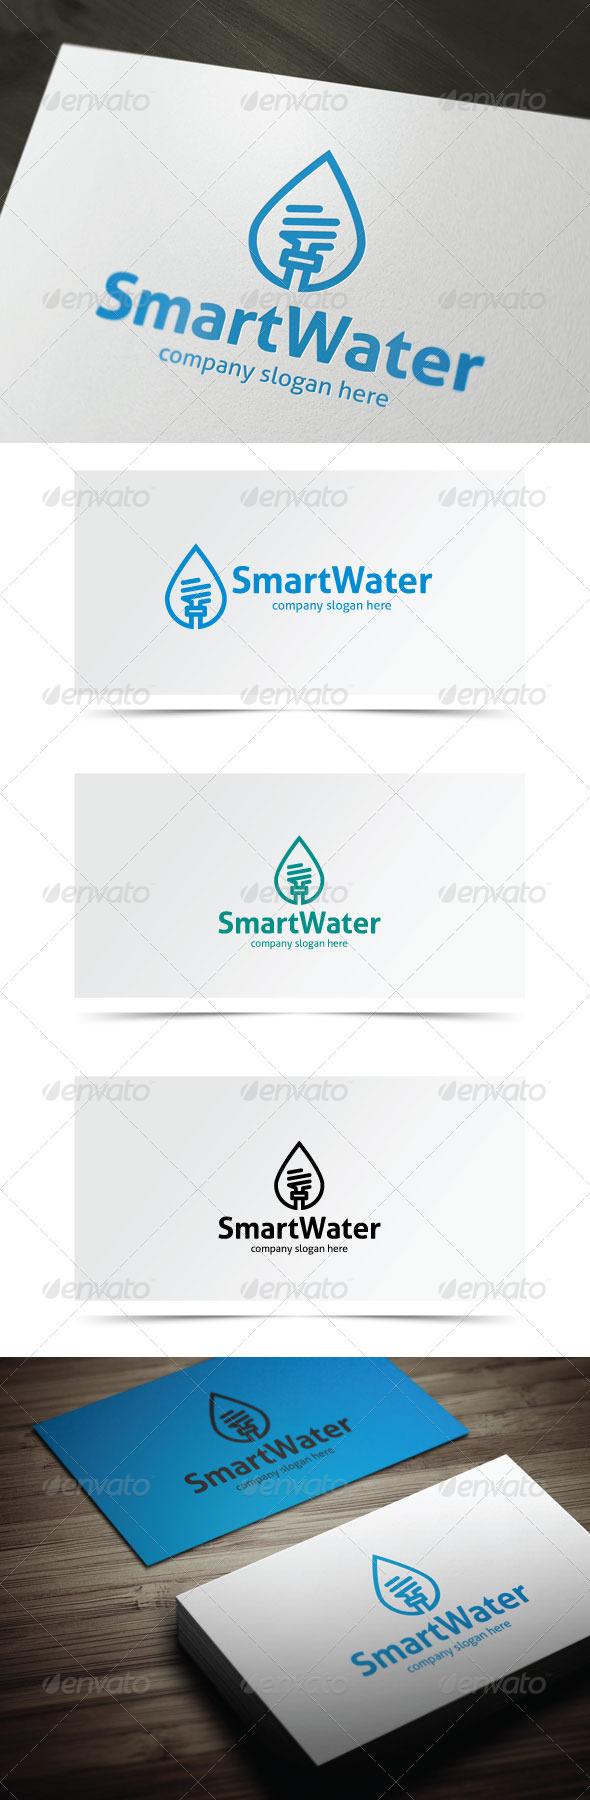 GraphicRiver Smart Water 6562196